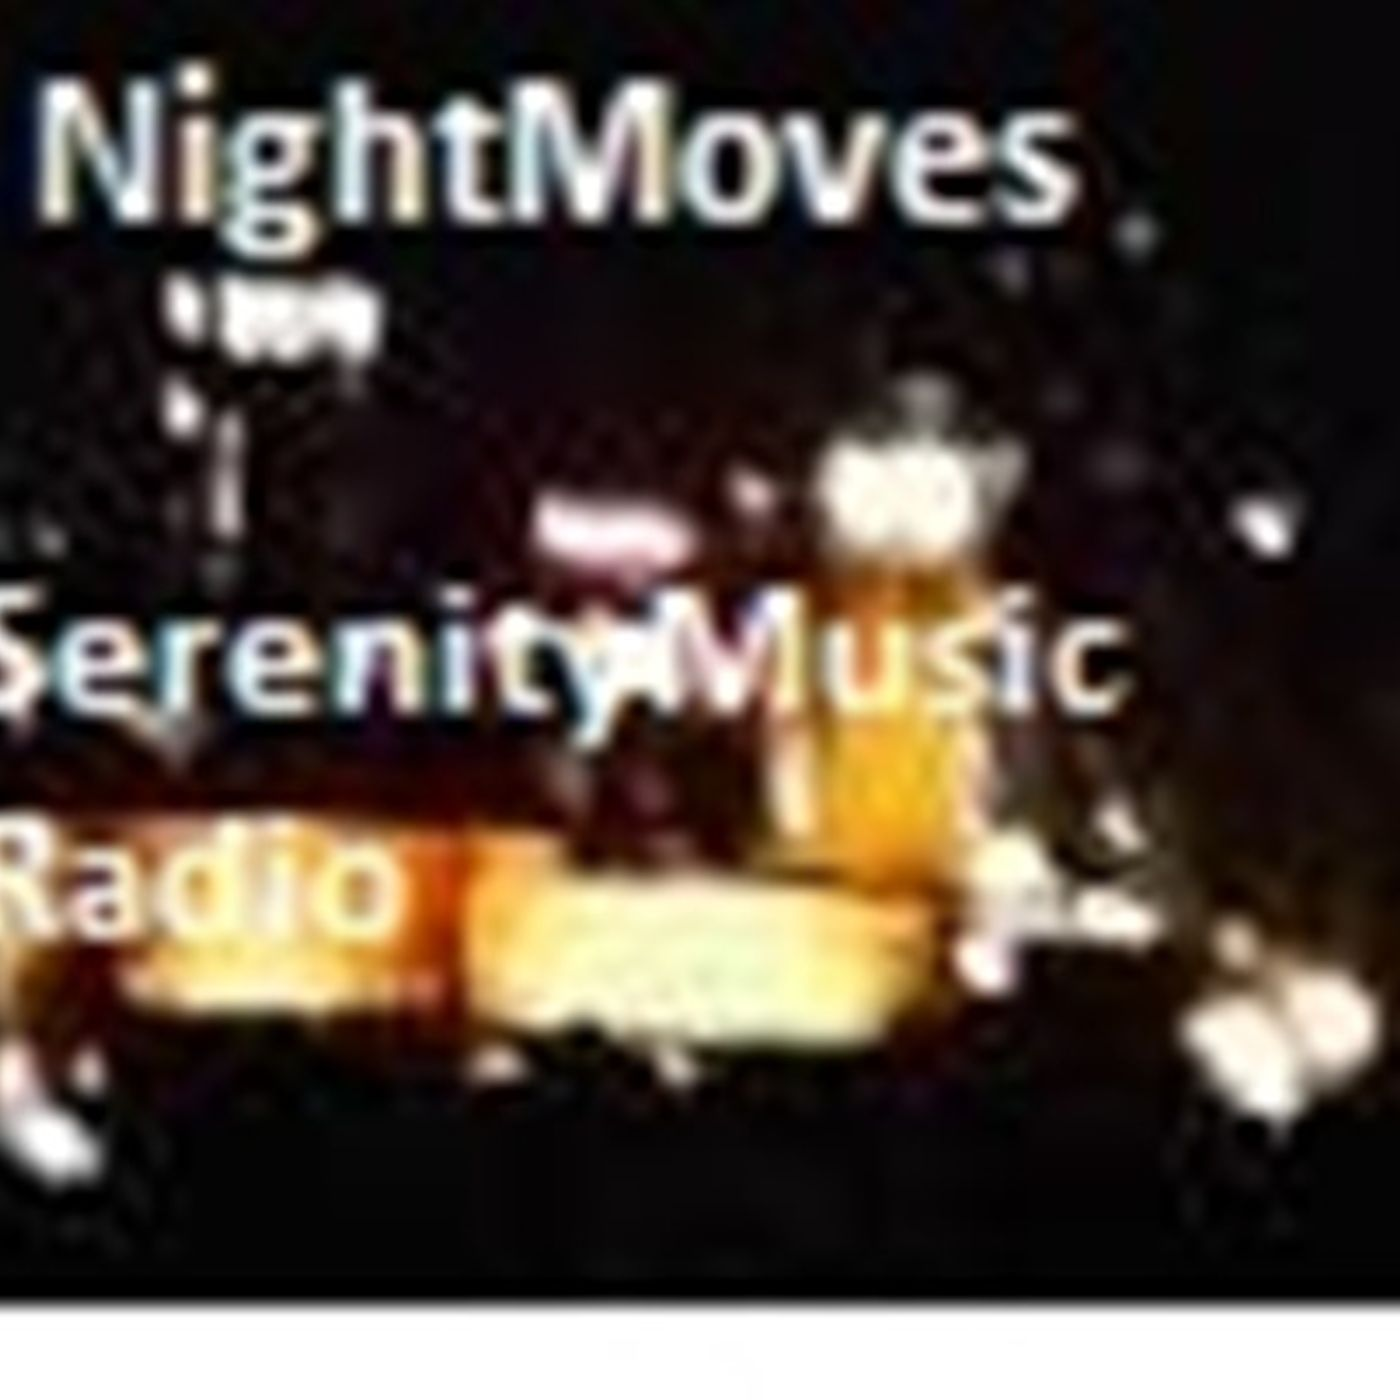 SerenityMusicRadio NiTeMiX OnLine